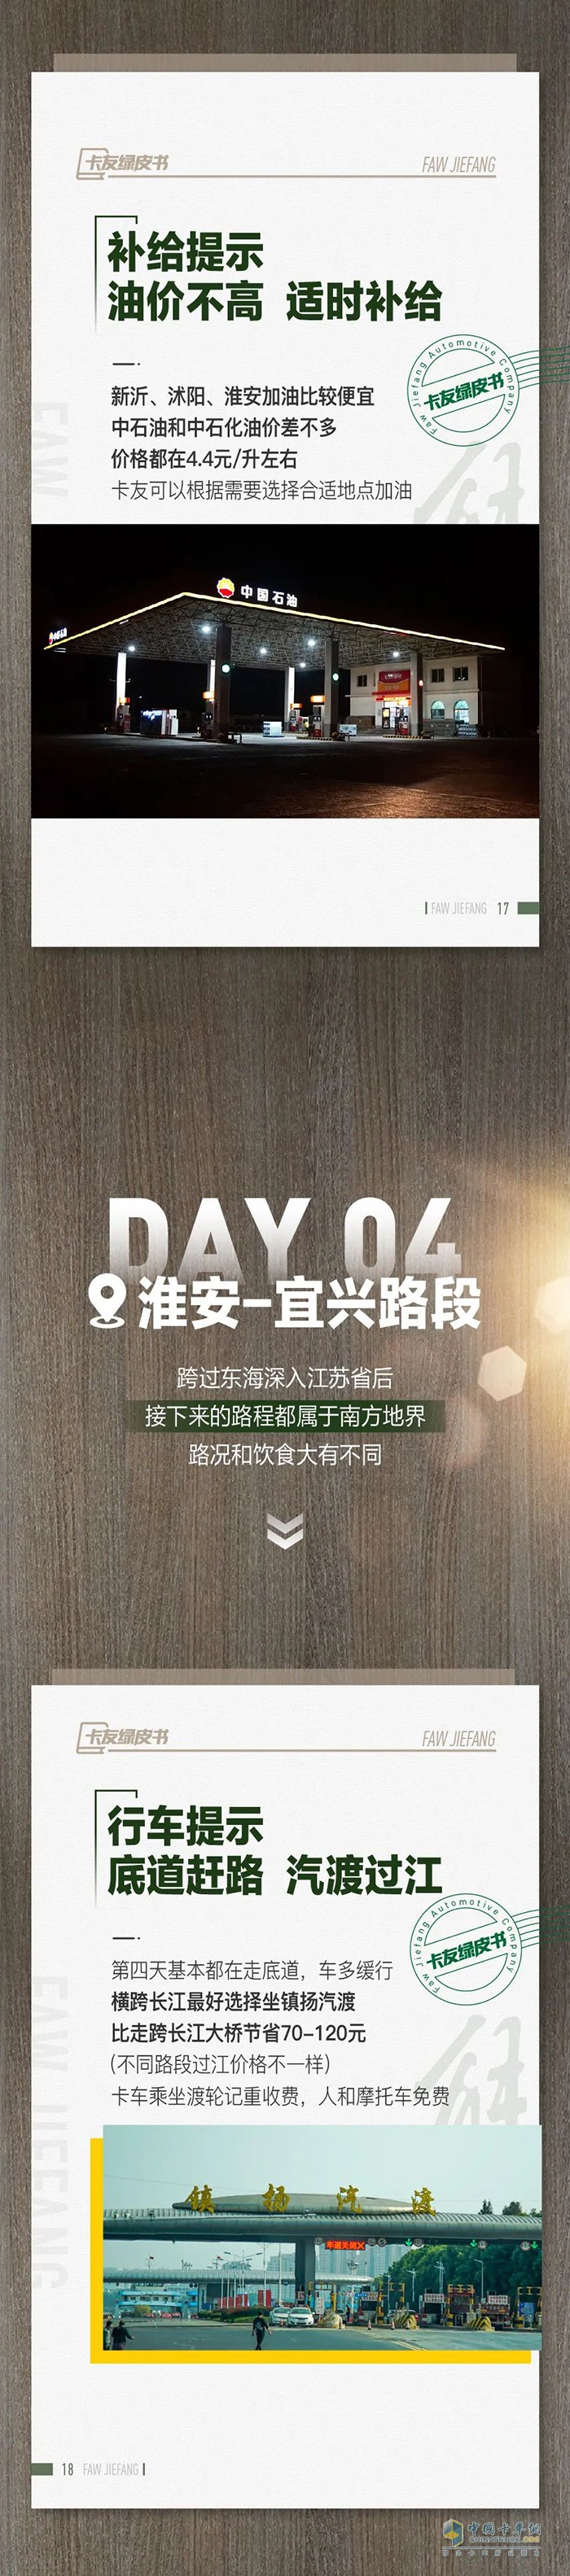 J7坐船横渡长江,《卡友绿皮书》省钱有方!